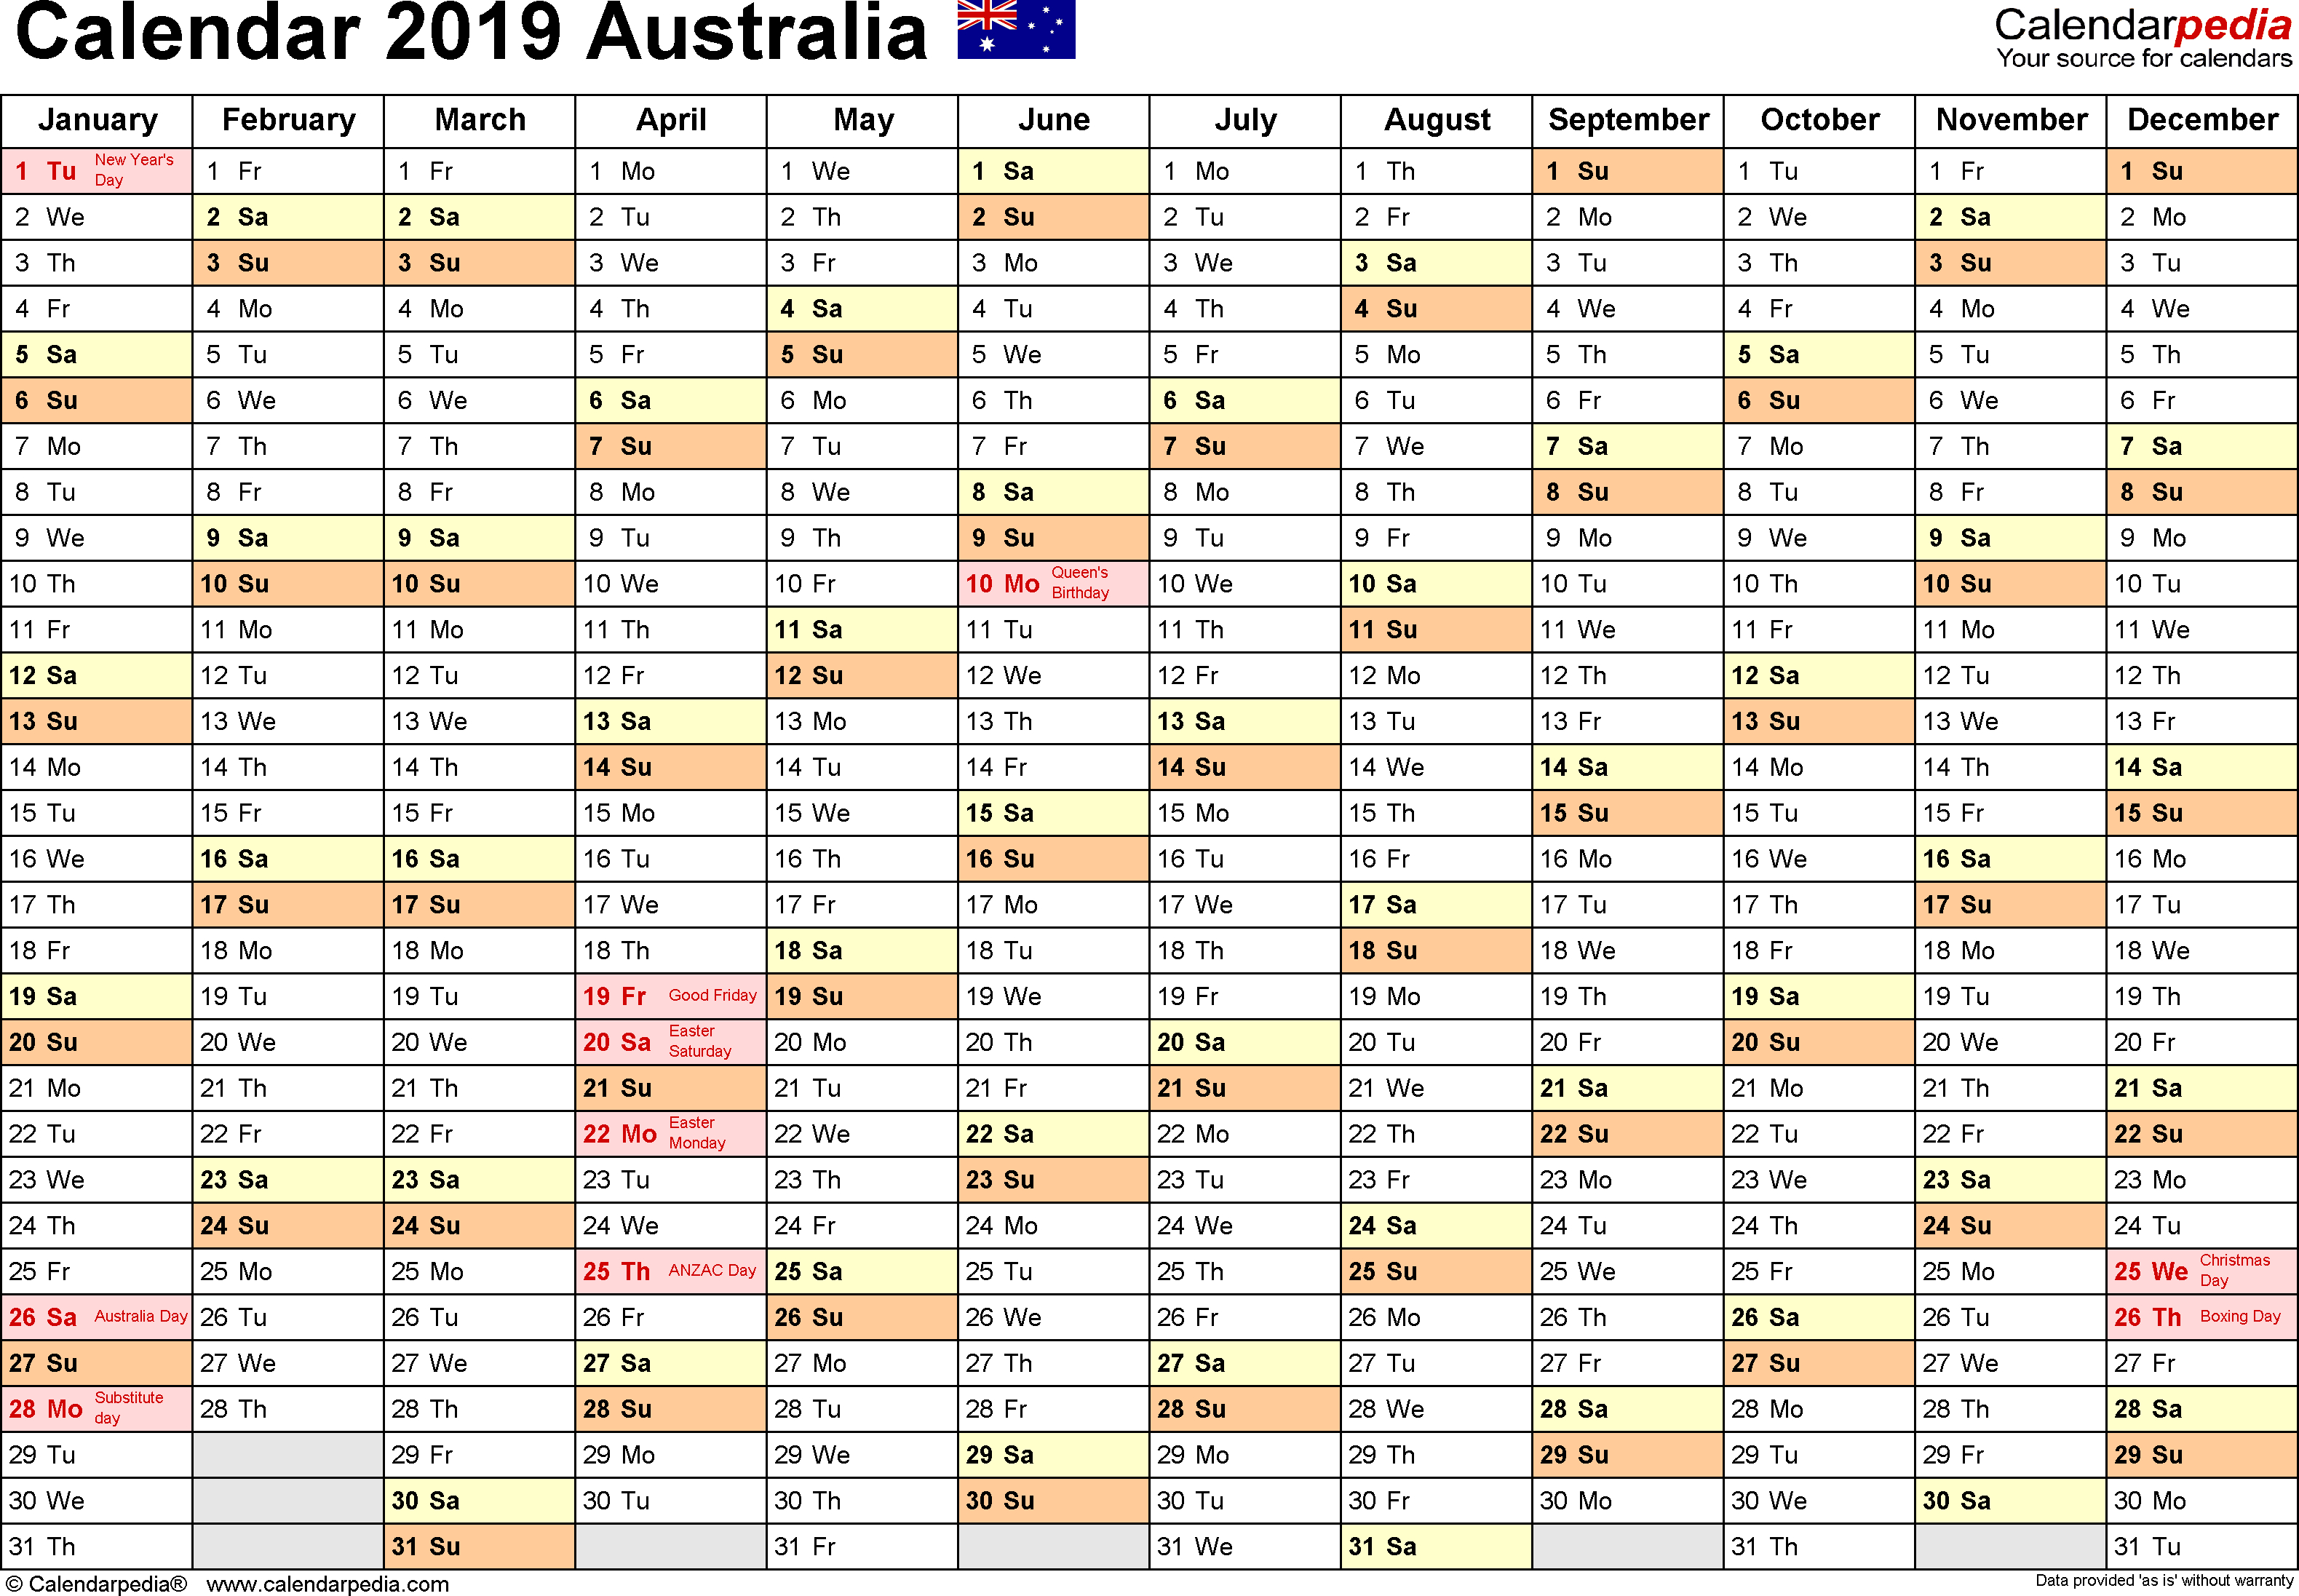 Australia Calendar 2019 - Free Printable Pdf Templates with 2020 School Calendar Qld State Schools